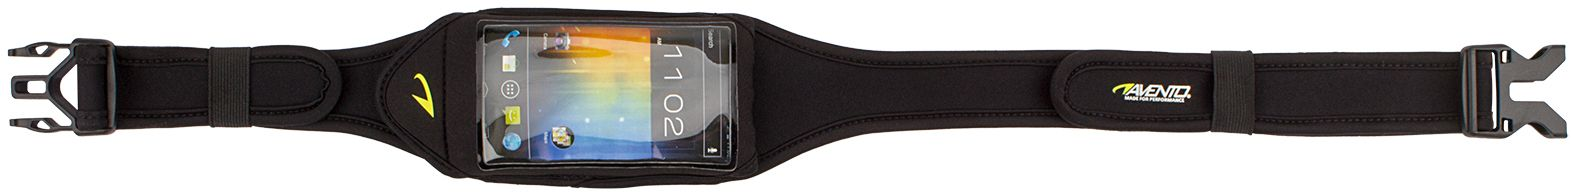 Smartphone Sport Riem